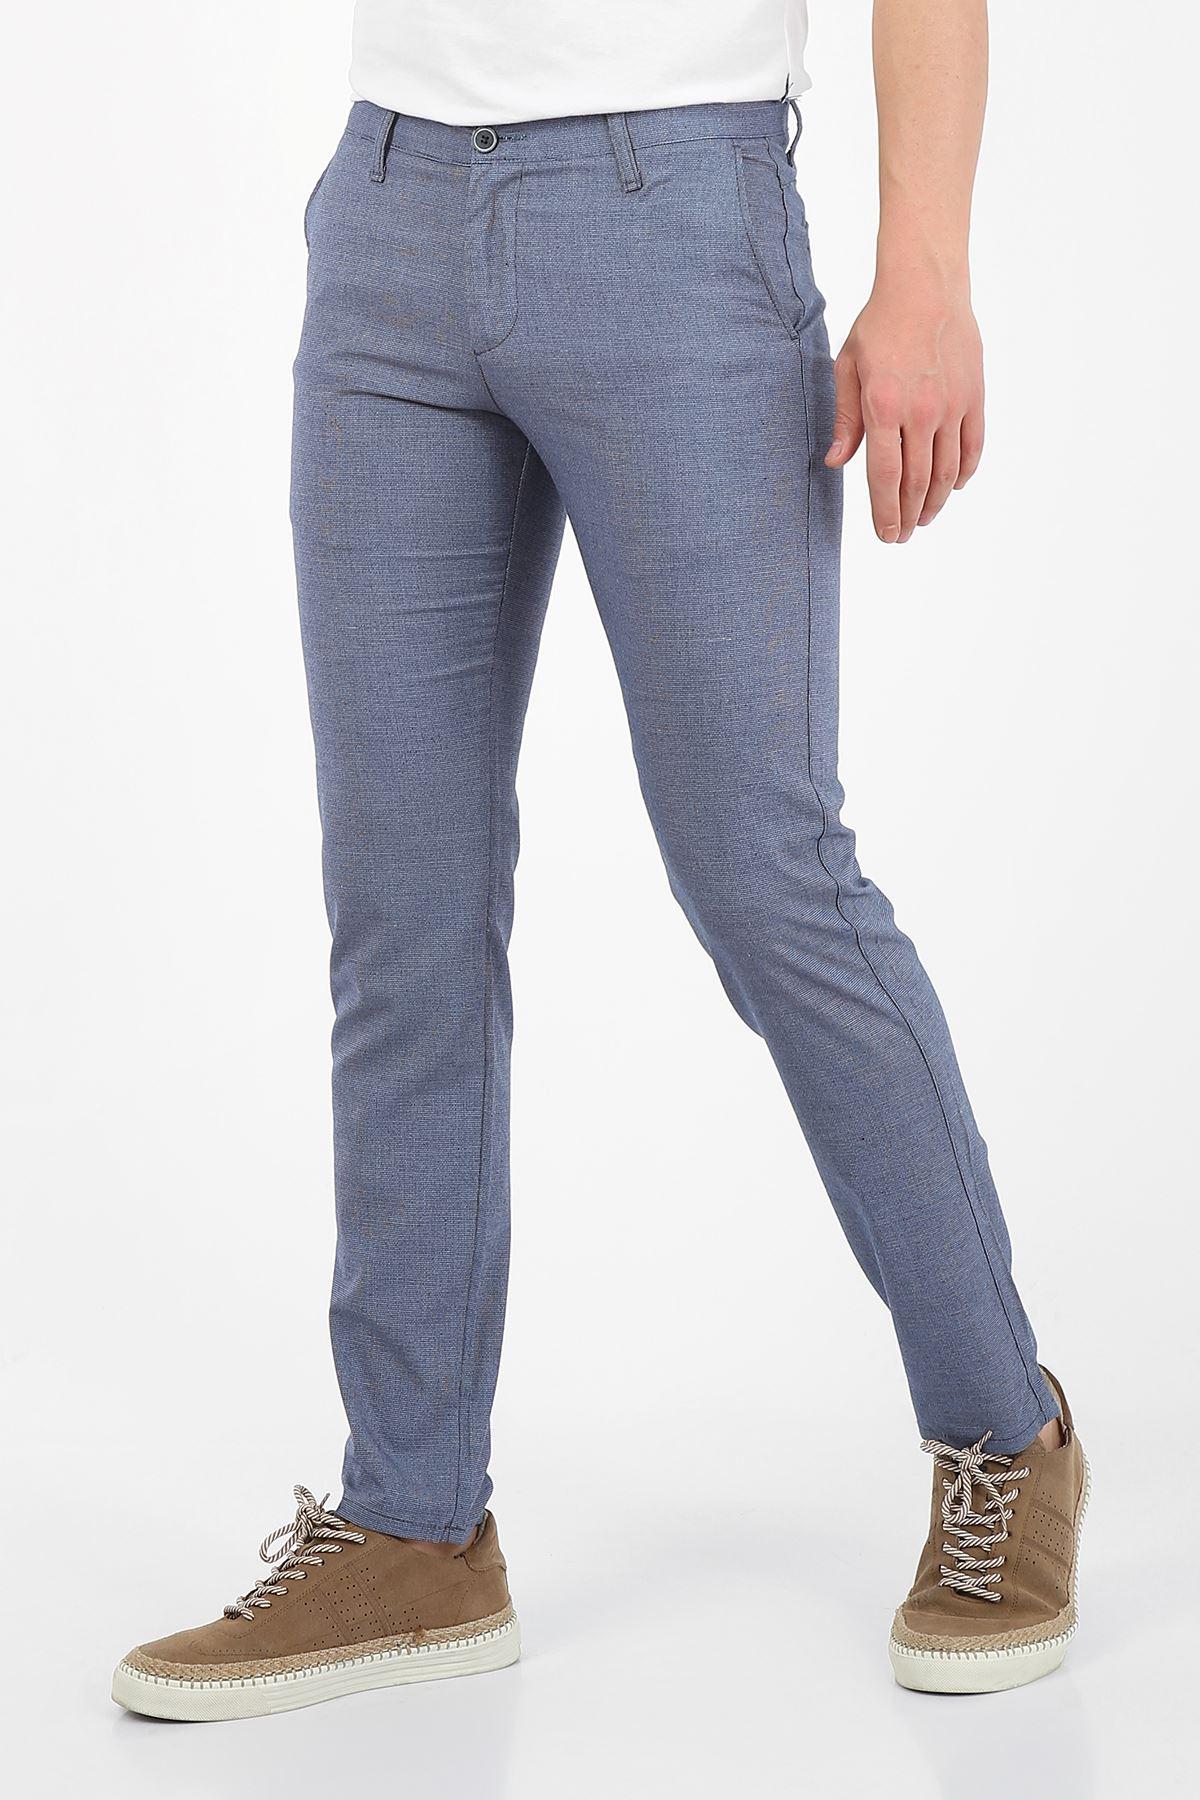 Mavi Slim Fit Erkek Chino Pantolon -OLİVER